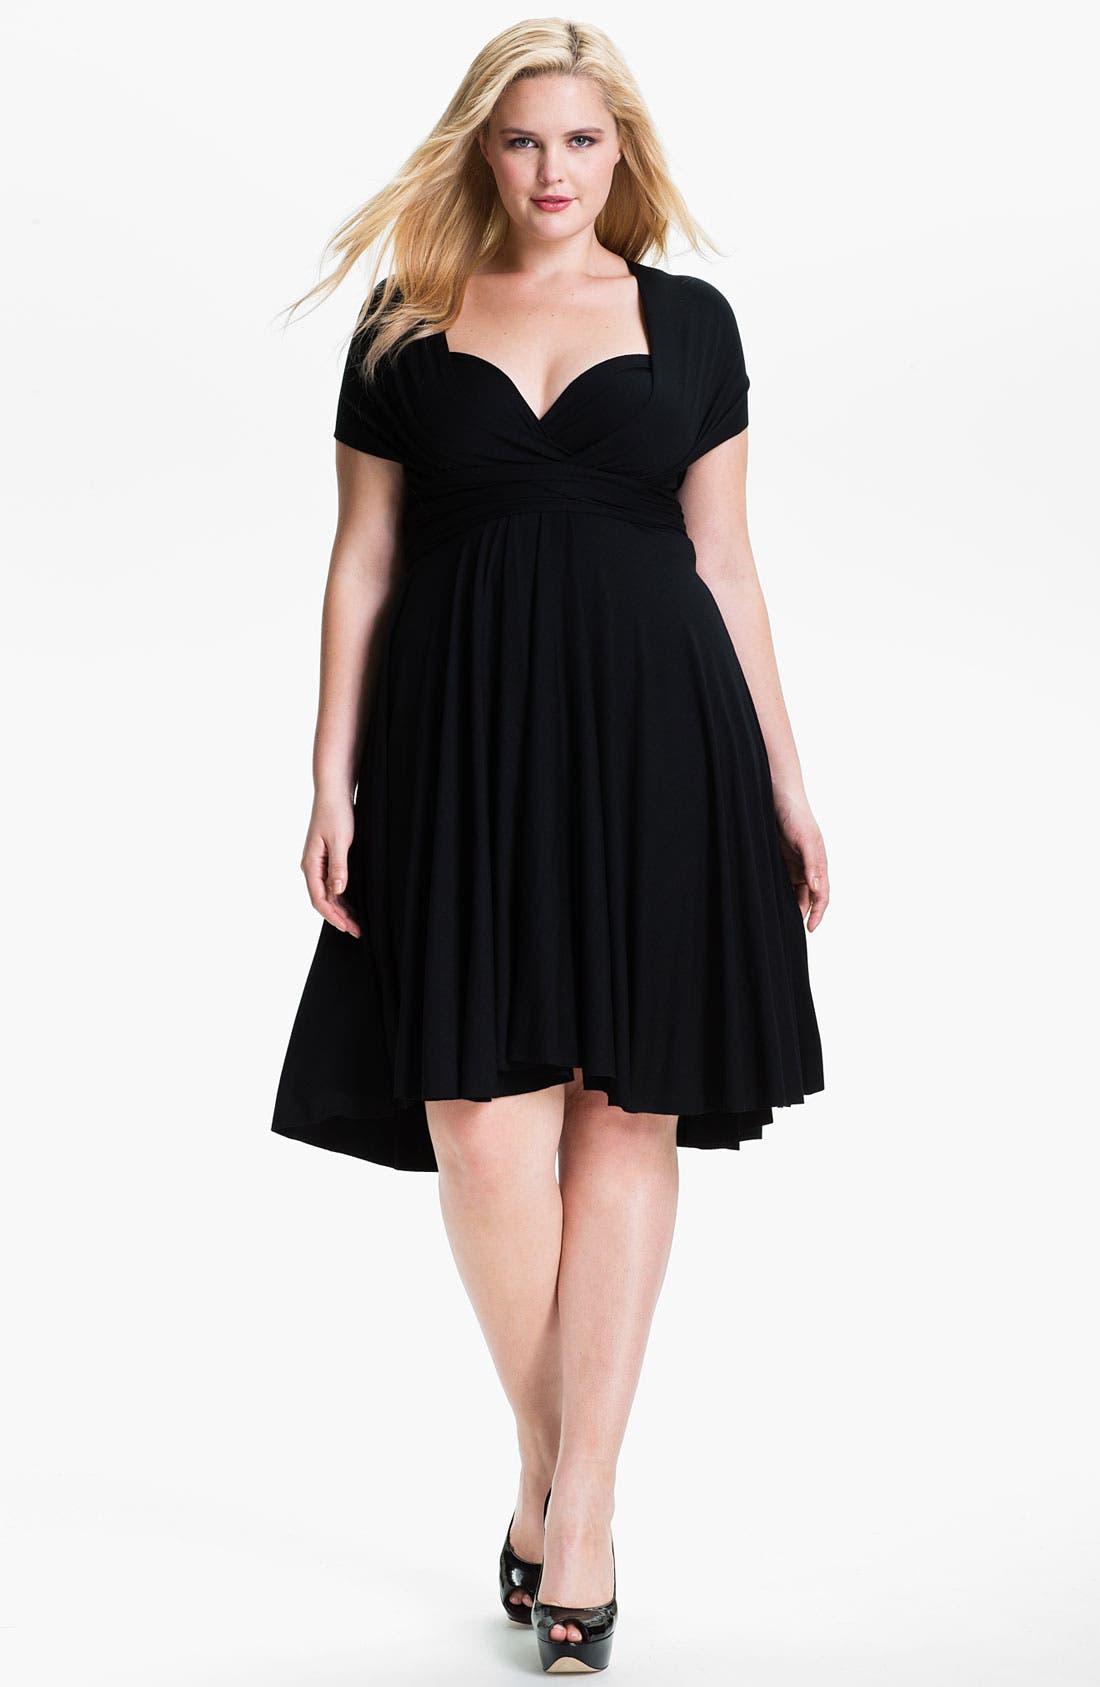 Main Image - Monif C 'Marilyn' Convertible Jersey Dress (Plus)